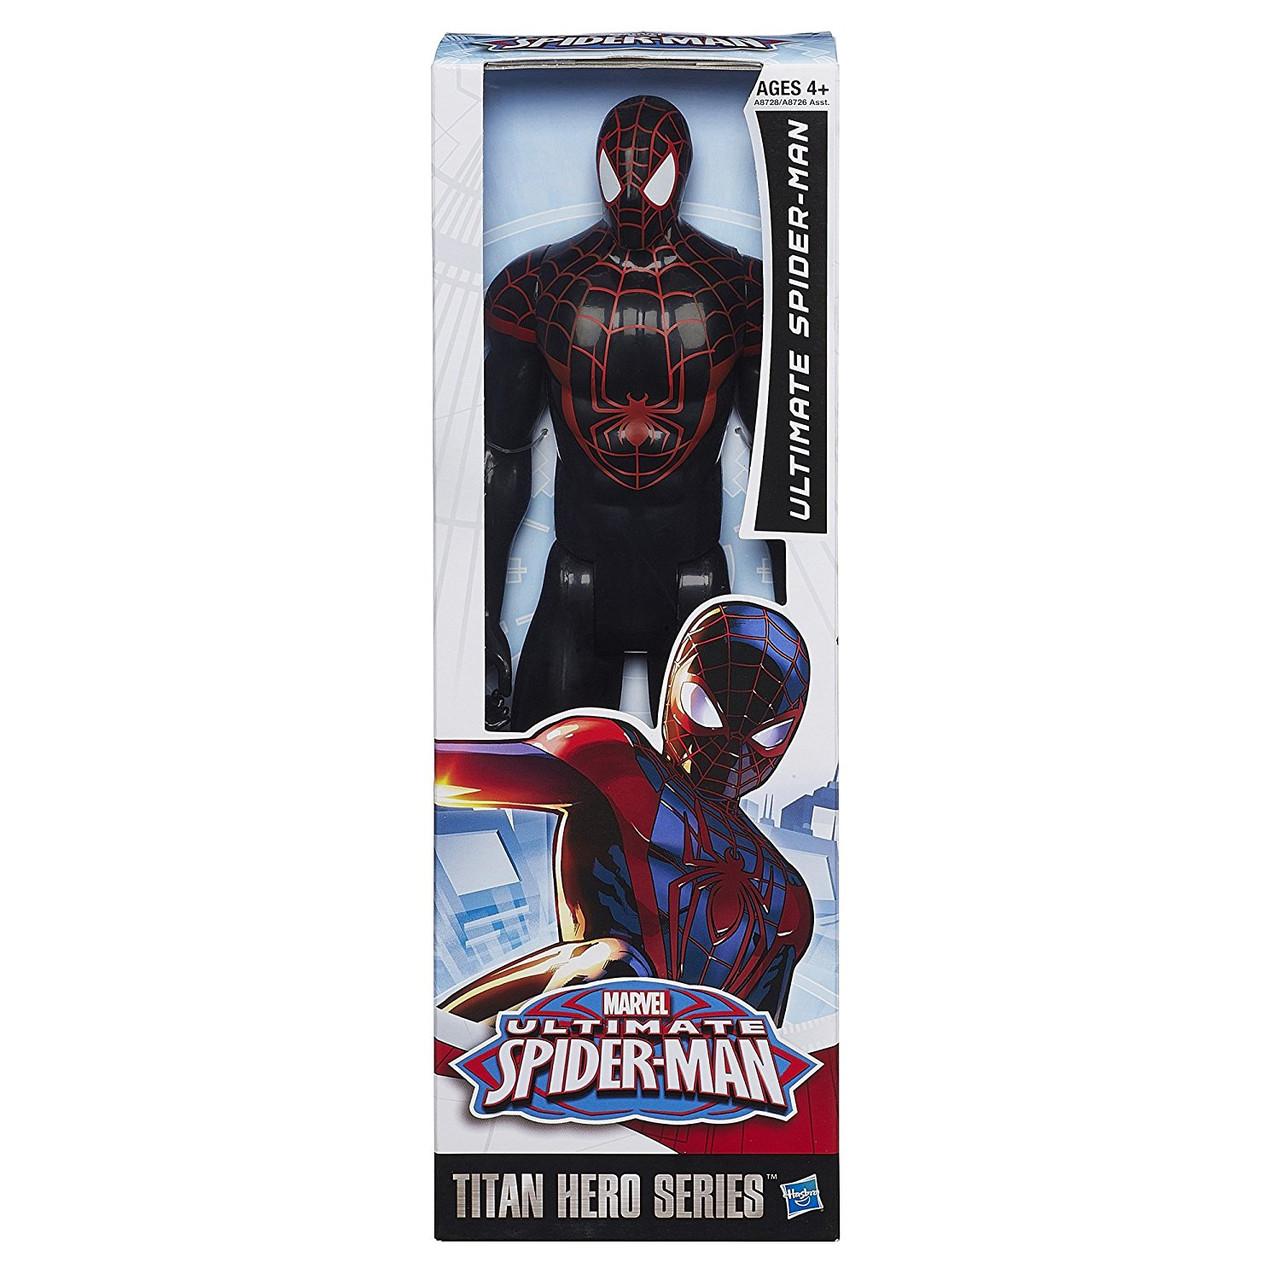 "Игрушка-фигурка Совершенный Человек-Паук - Ultimate Spider-man, ""Titan Hero Series"", Hasbro"